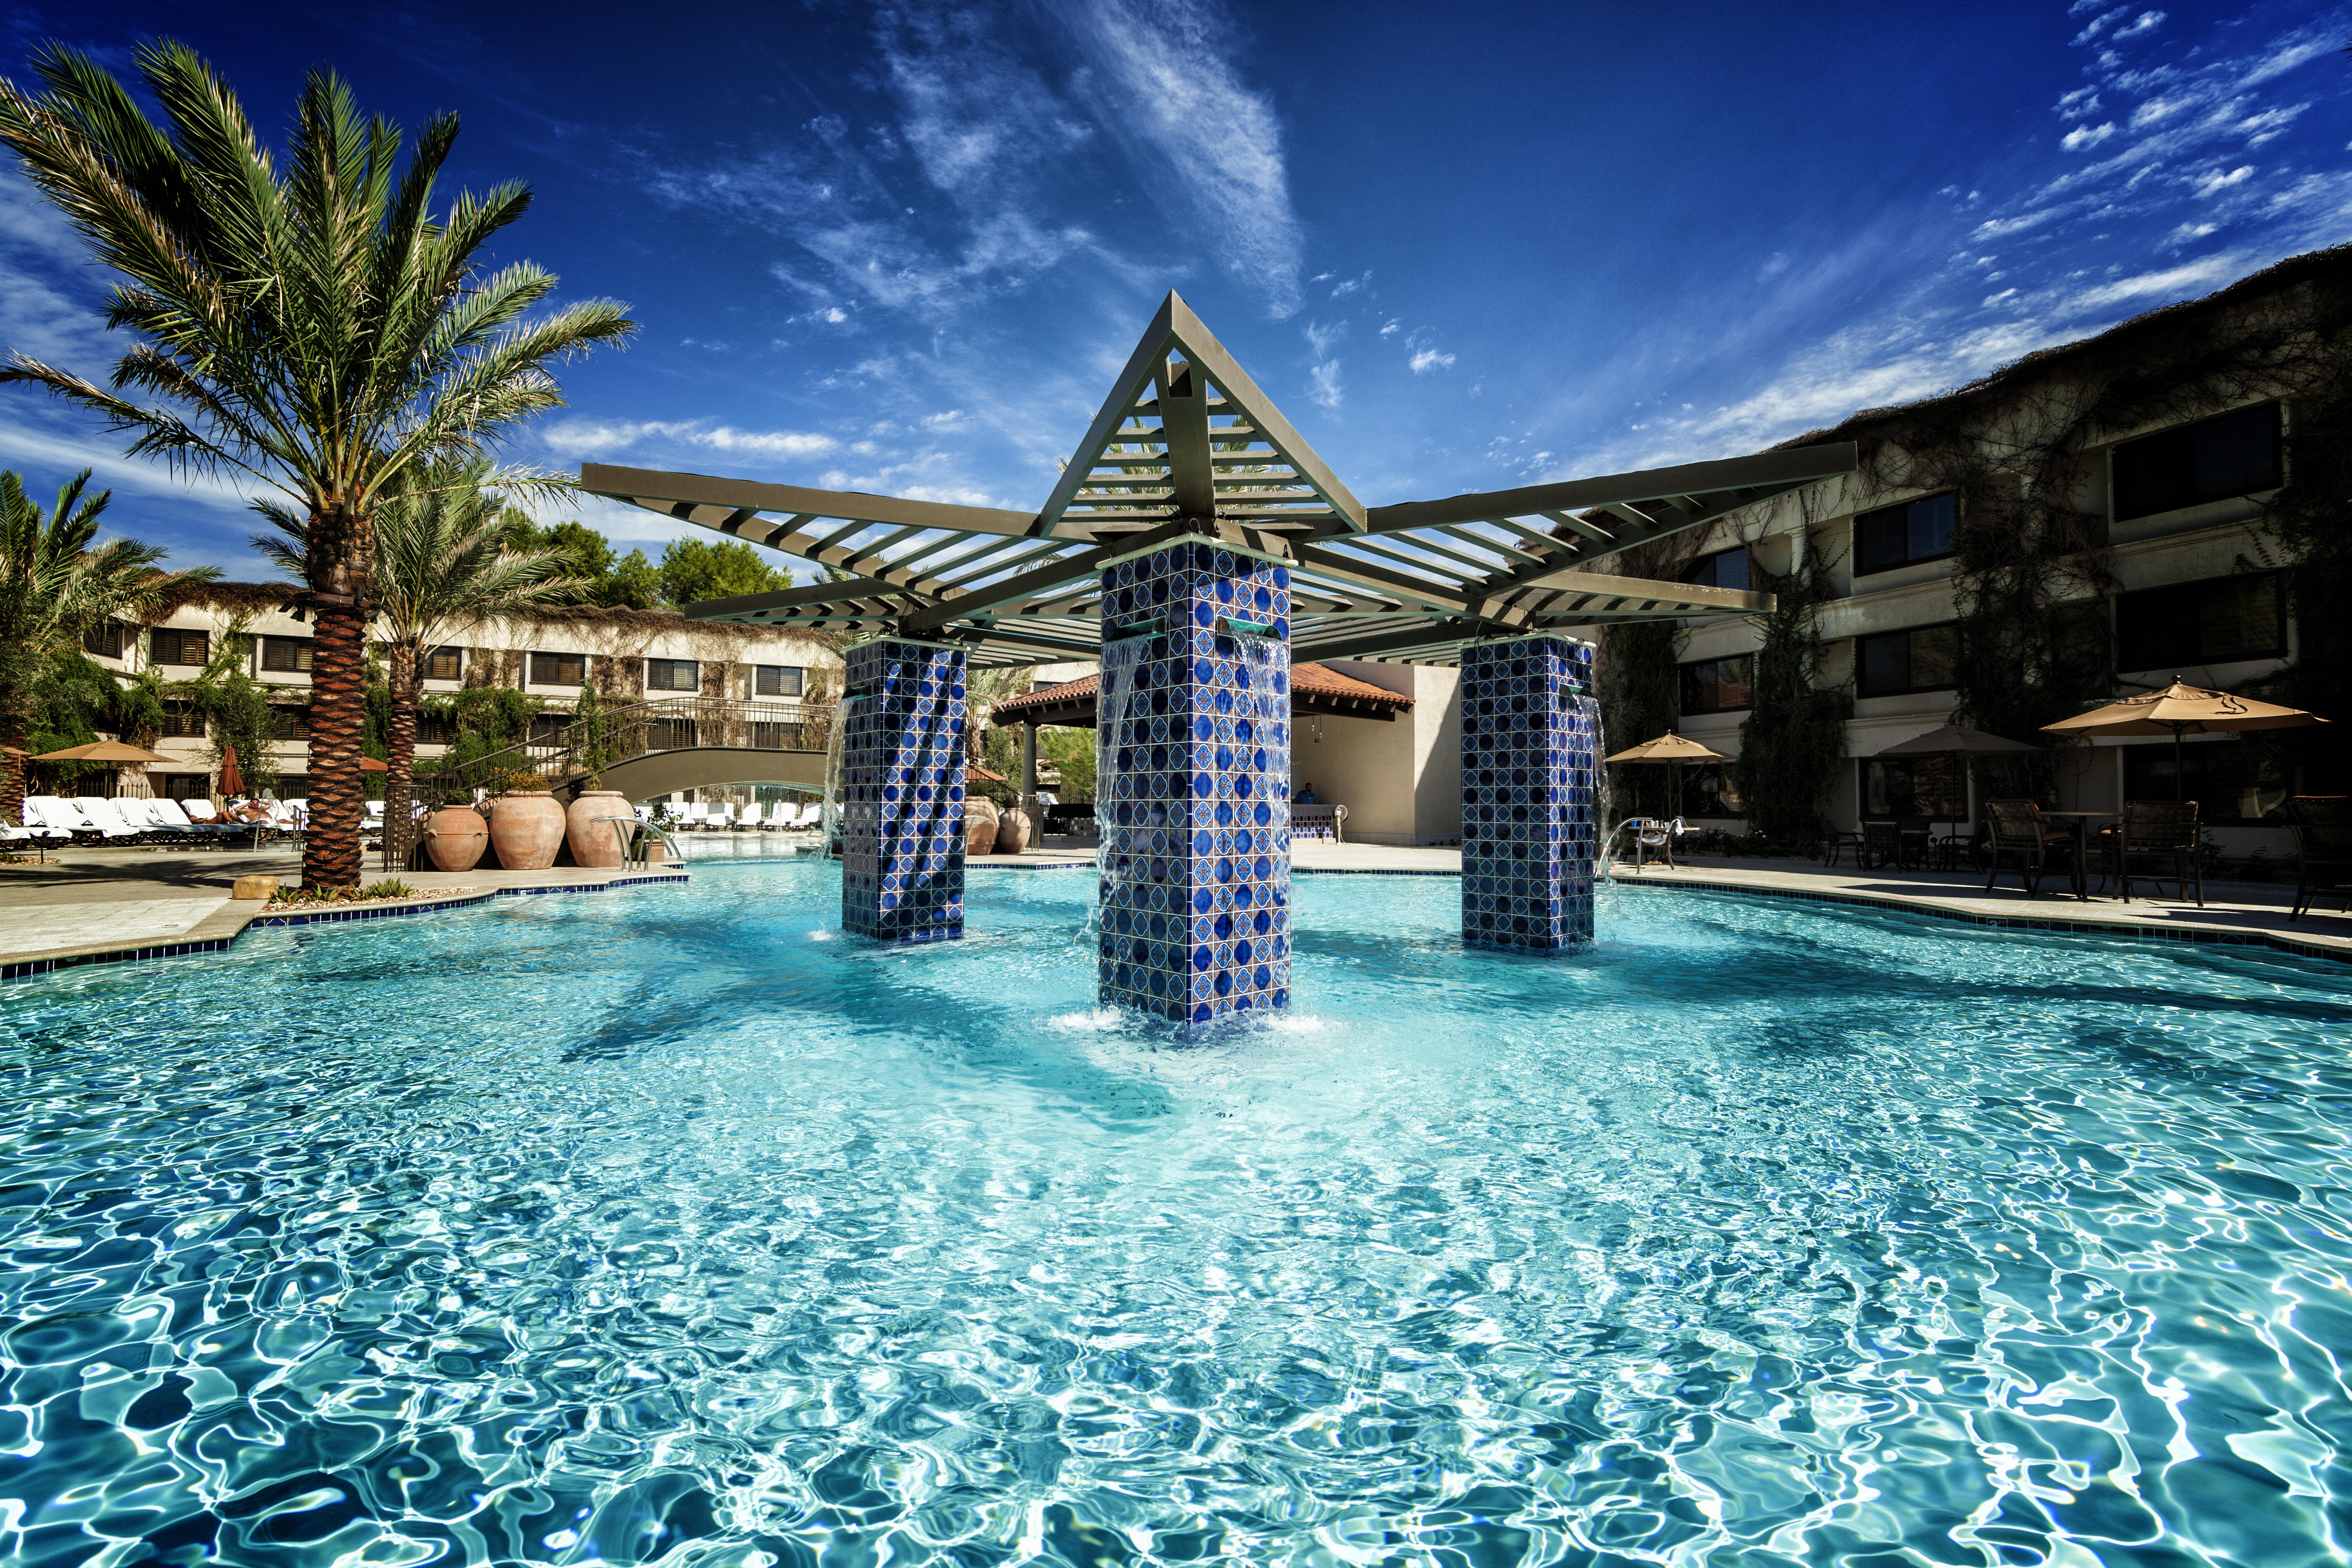 Scottsdale McCormick Pool Star